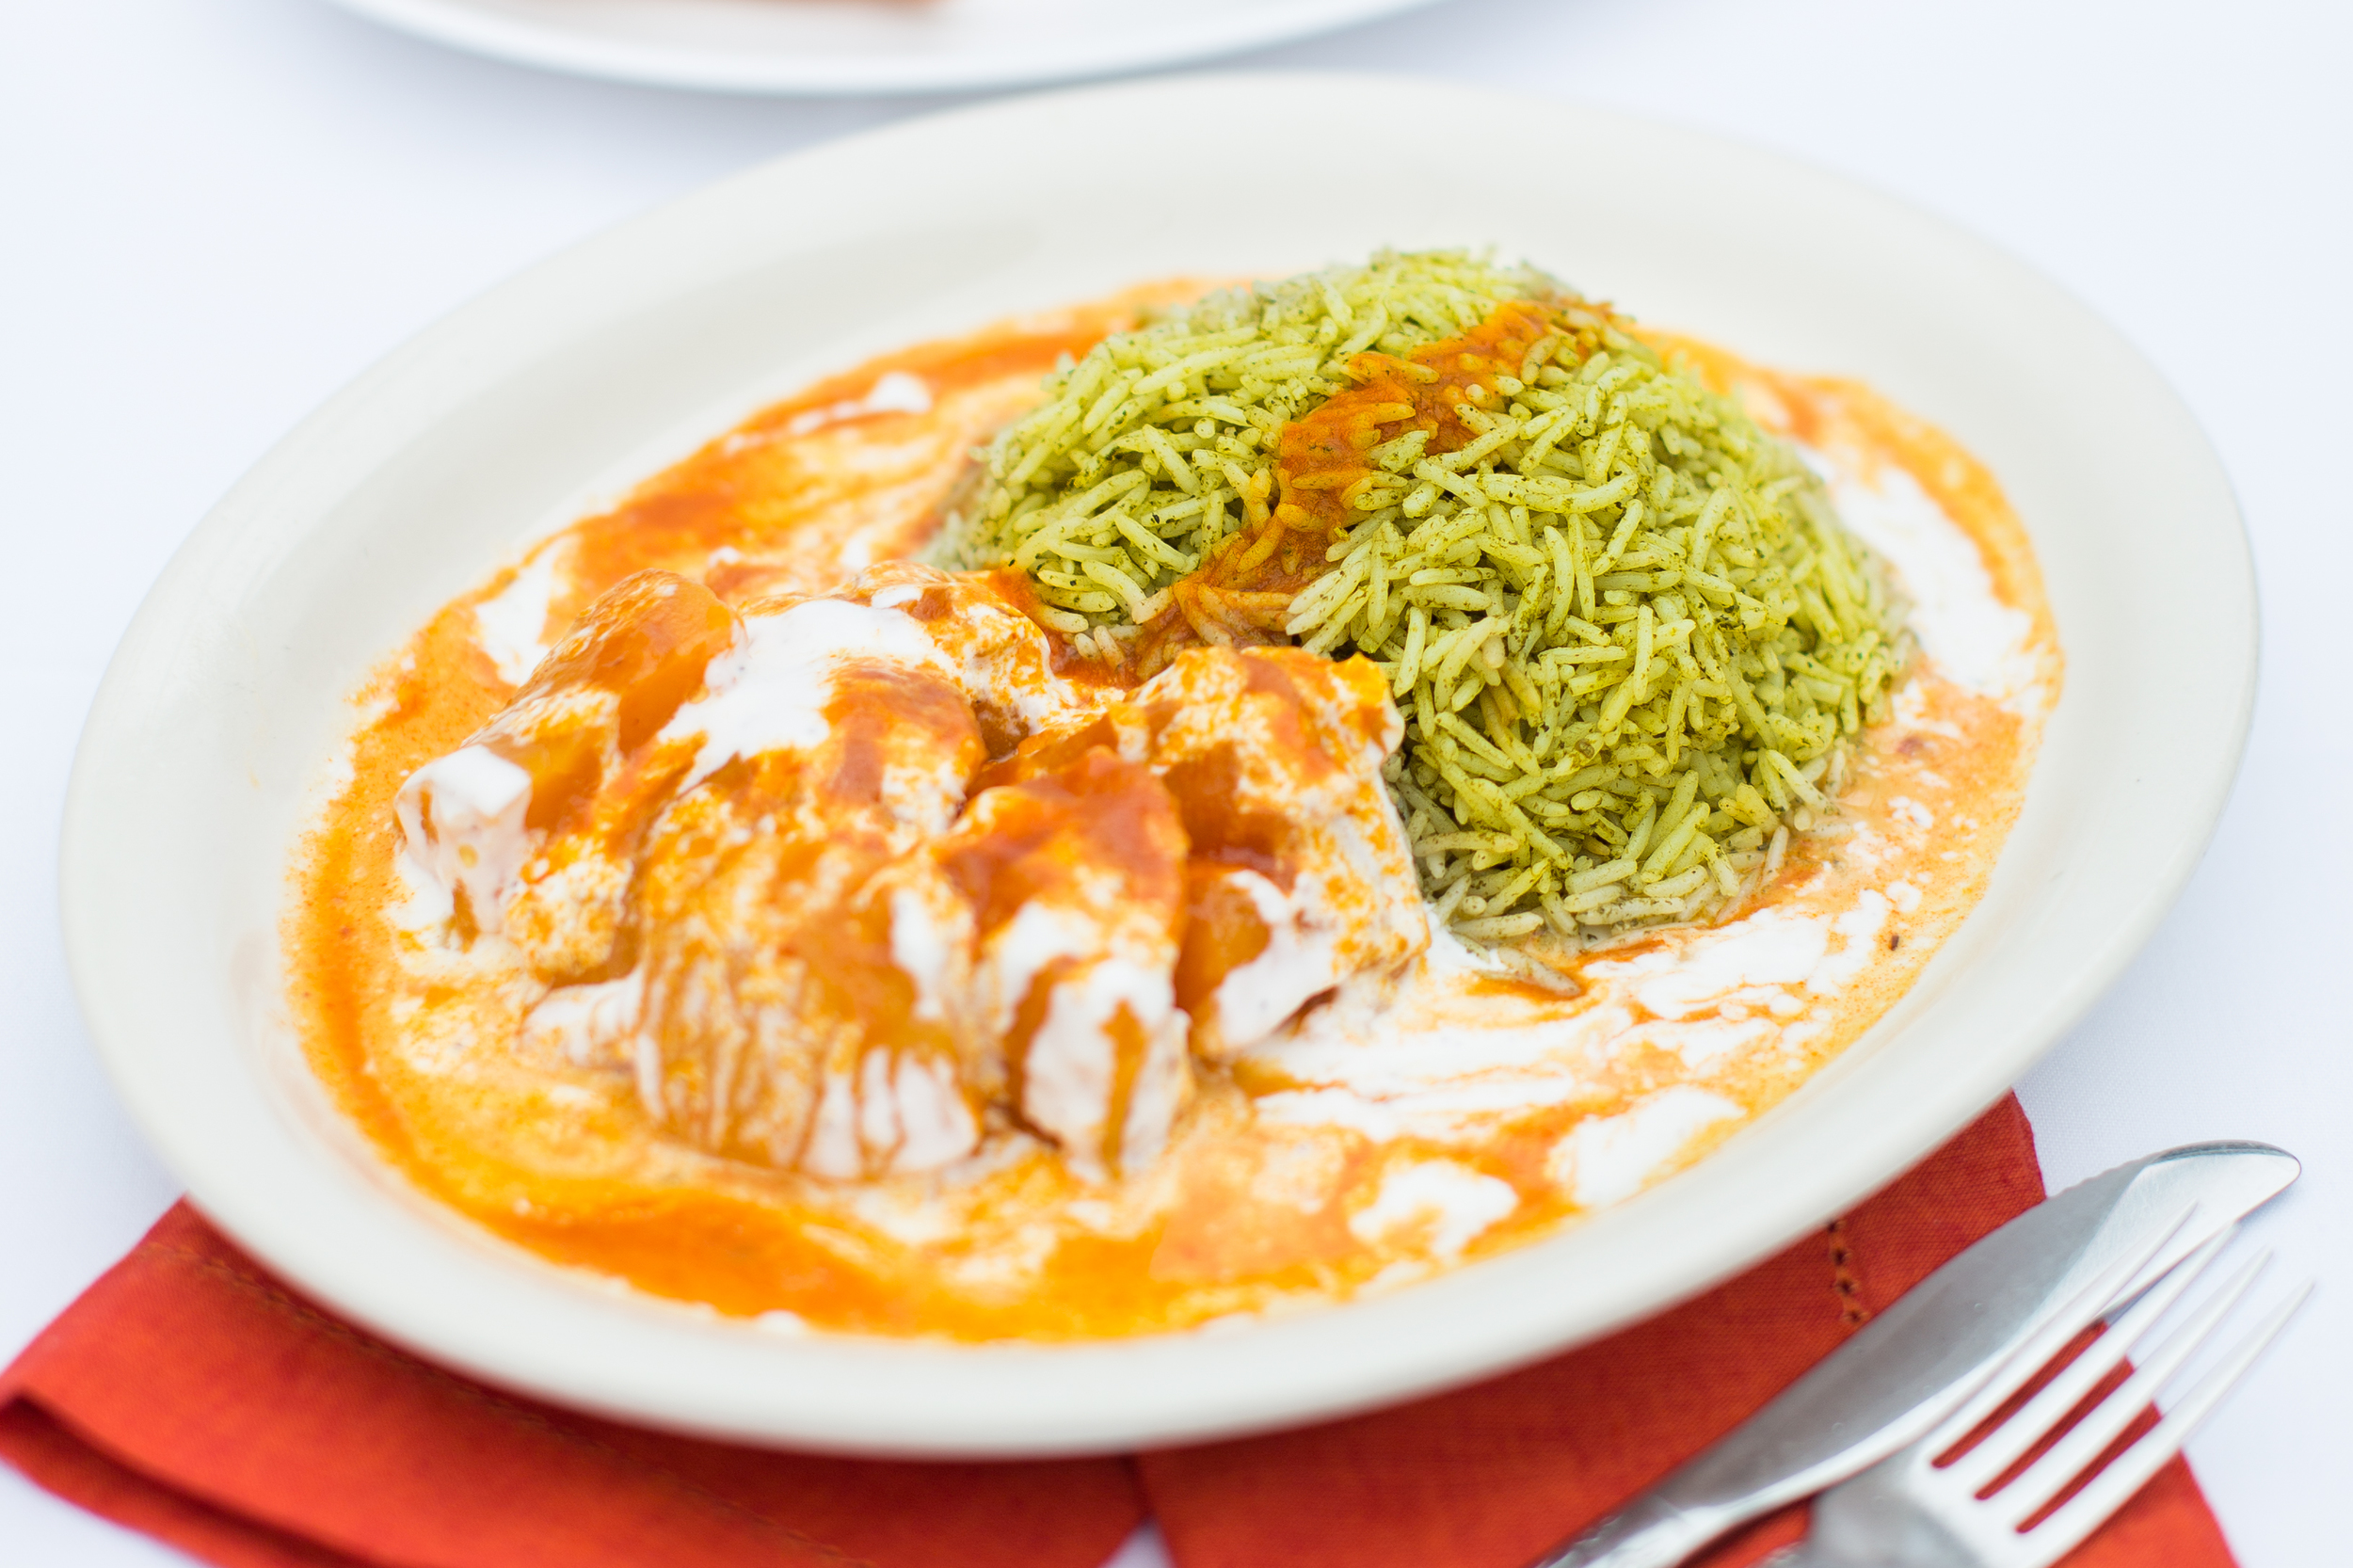 Panjshir-Cam-2-horizontal-4-nabu-food-photography.jpg